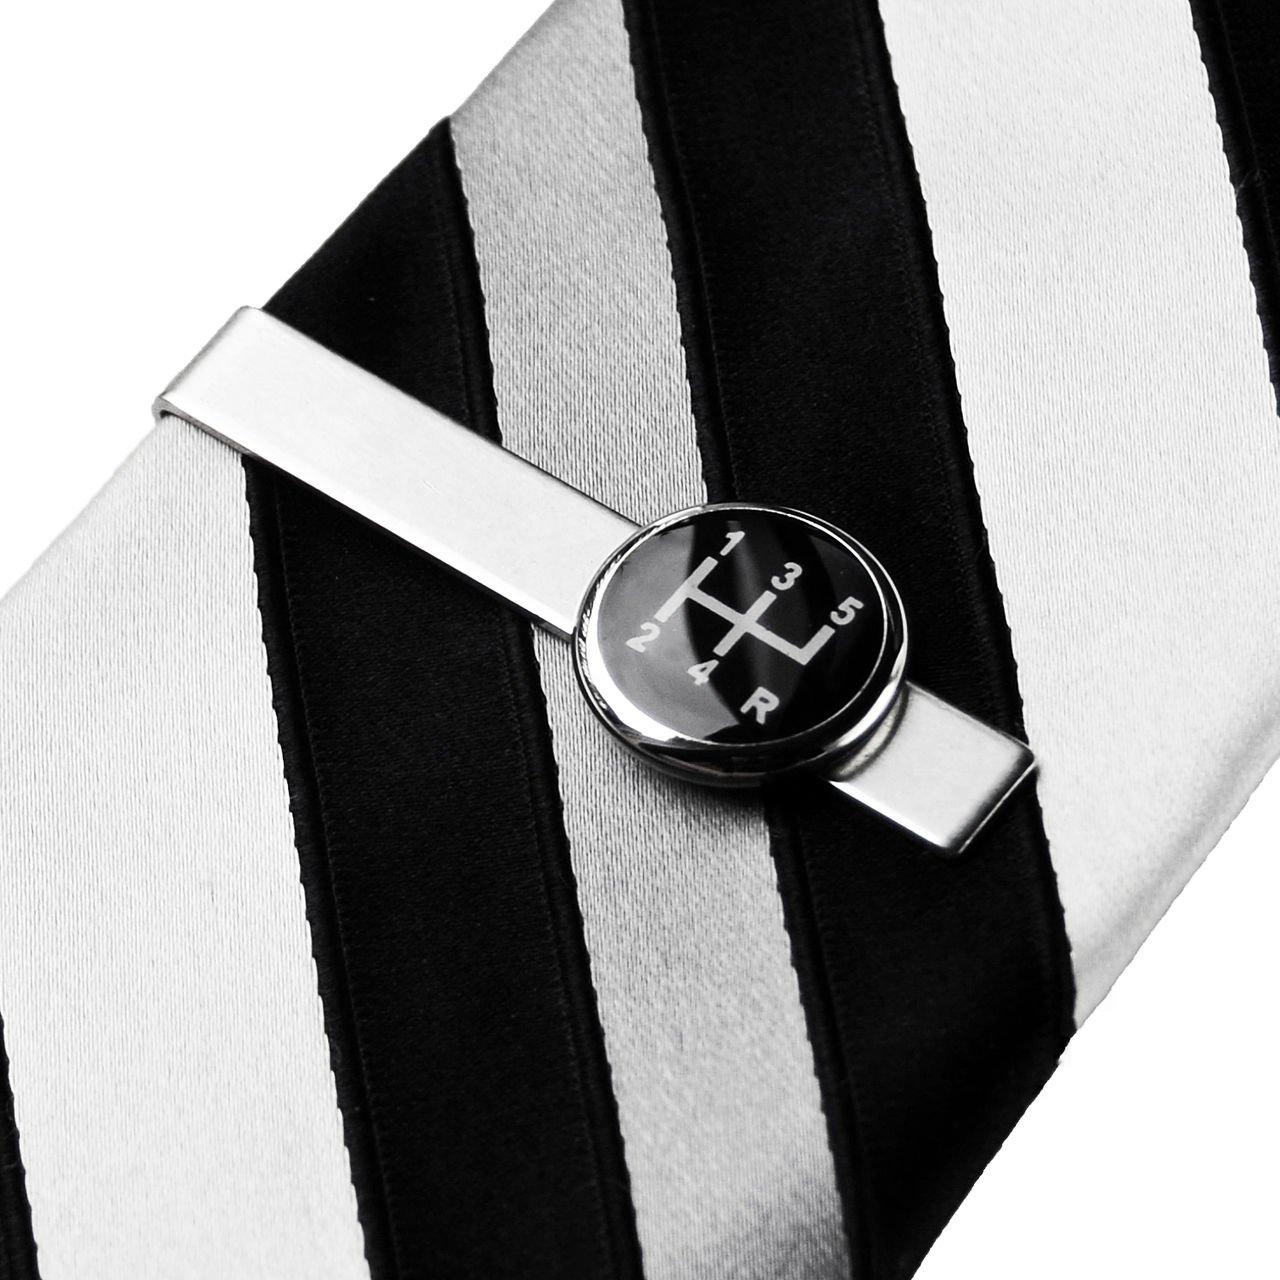 Gear Shift Tie Clip